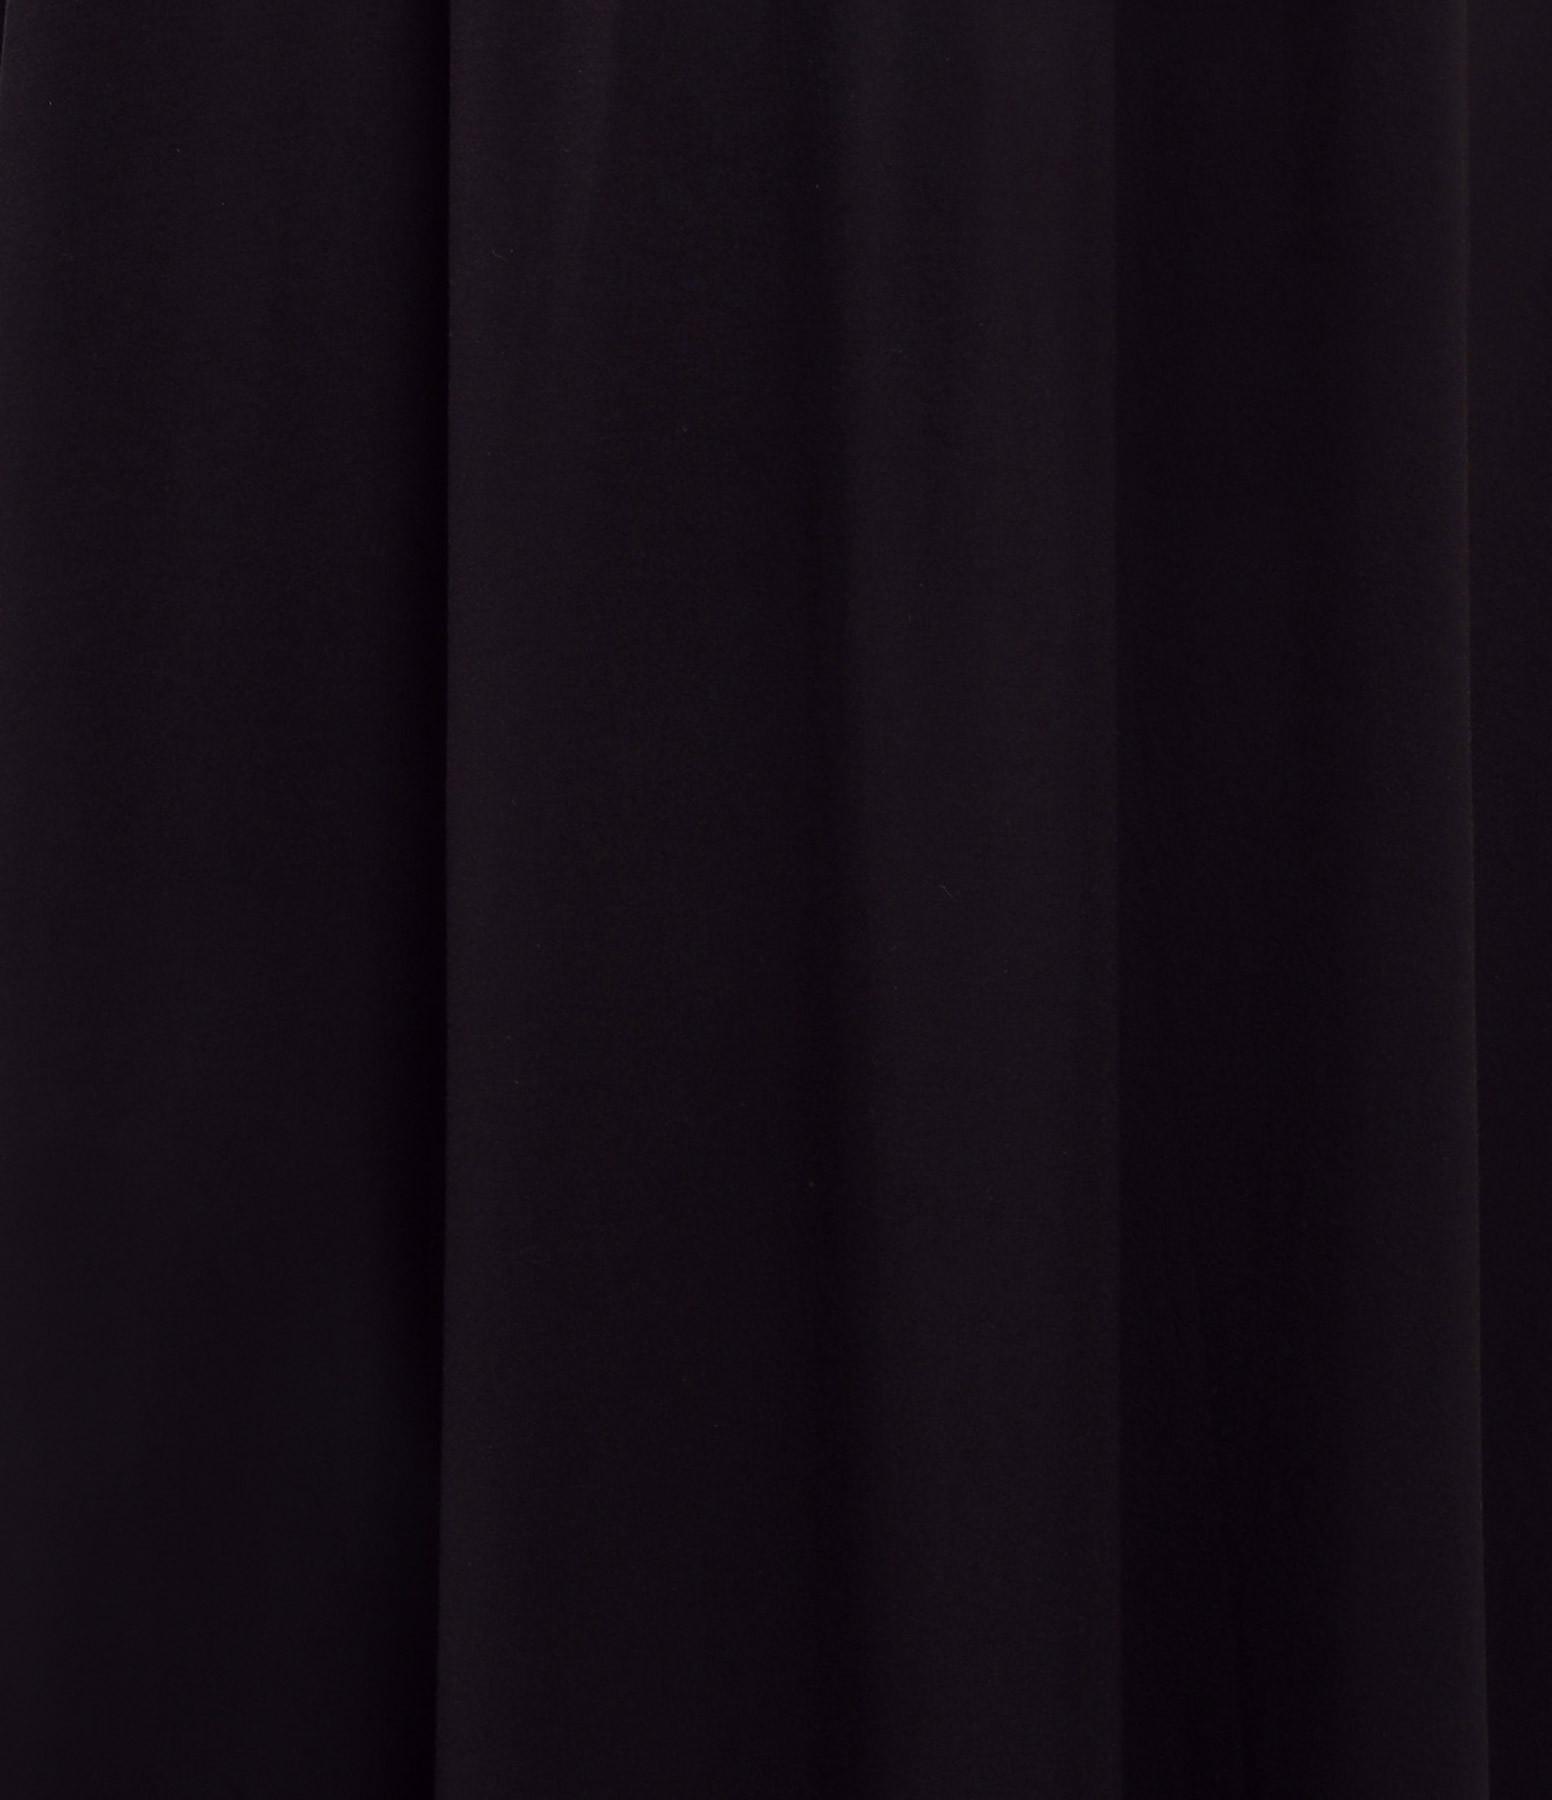 BELIZA - Jupe Gipsy Modal Noir